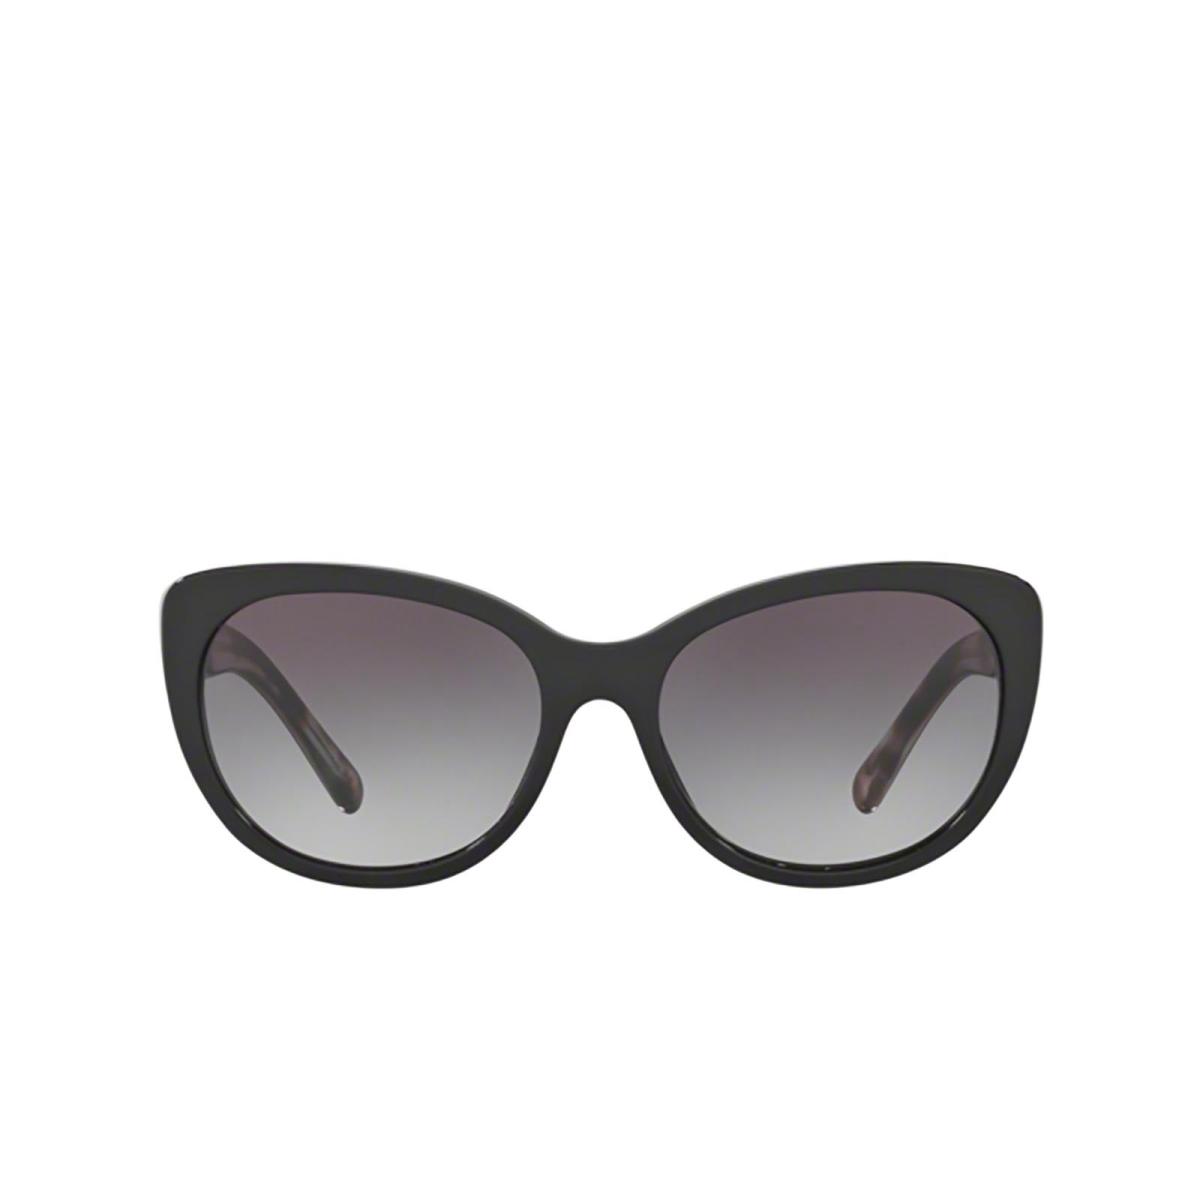 Burberry® Cat-eye Sunglasses: BE4224 color Black 30018G.